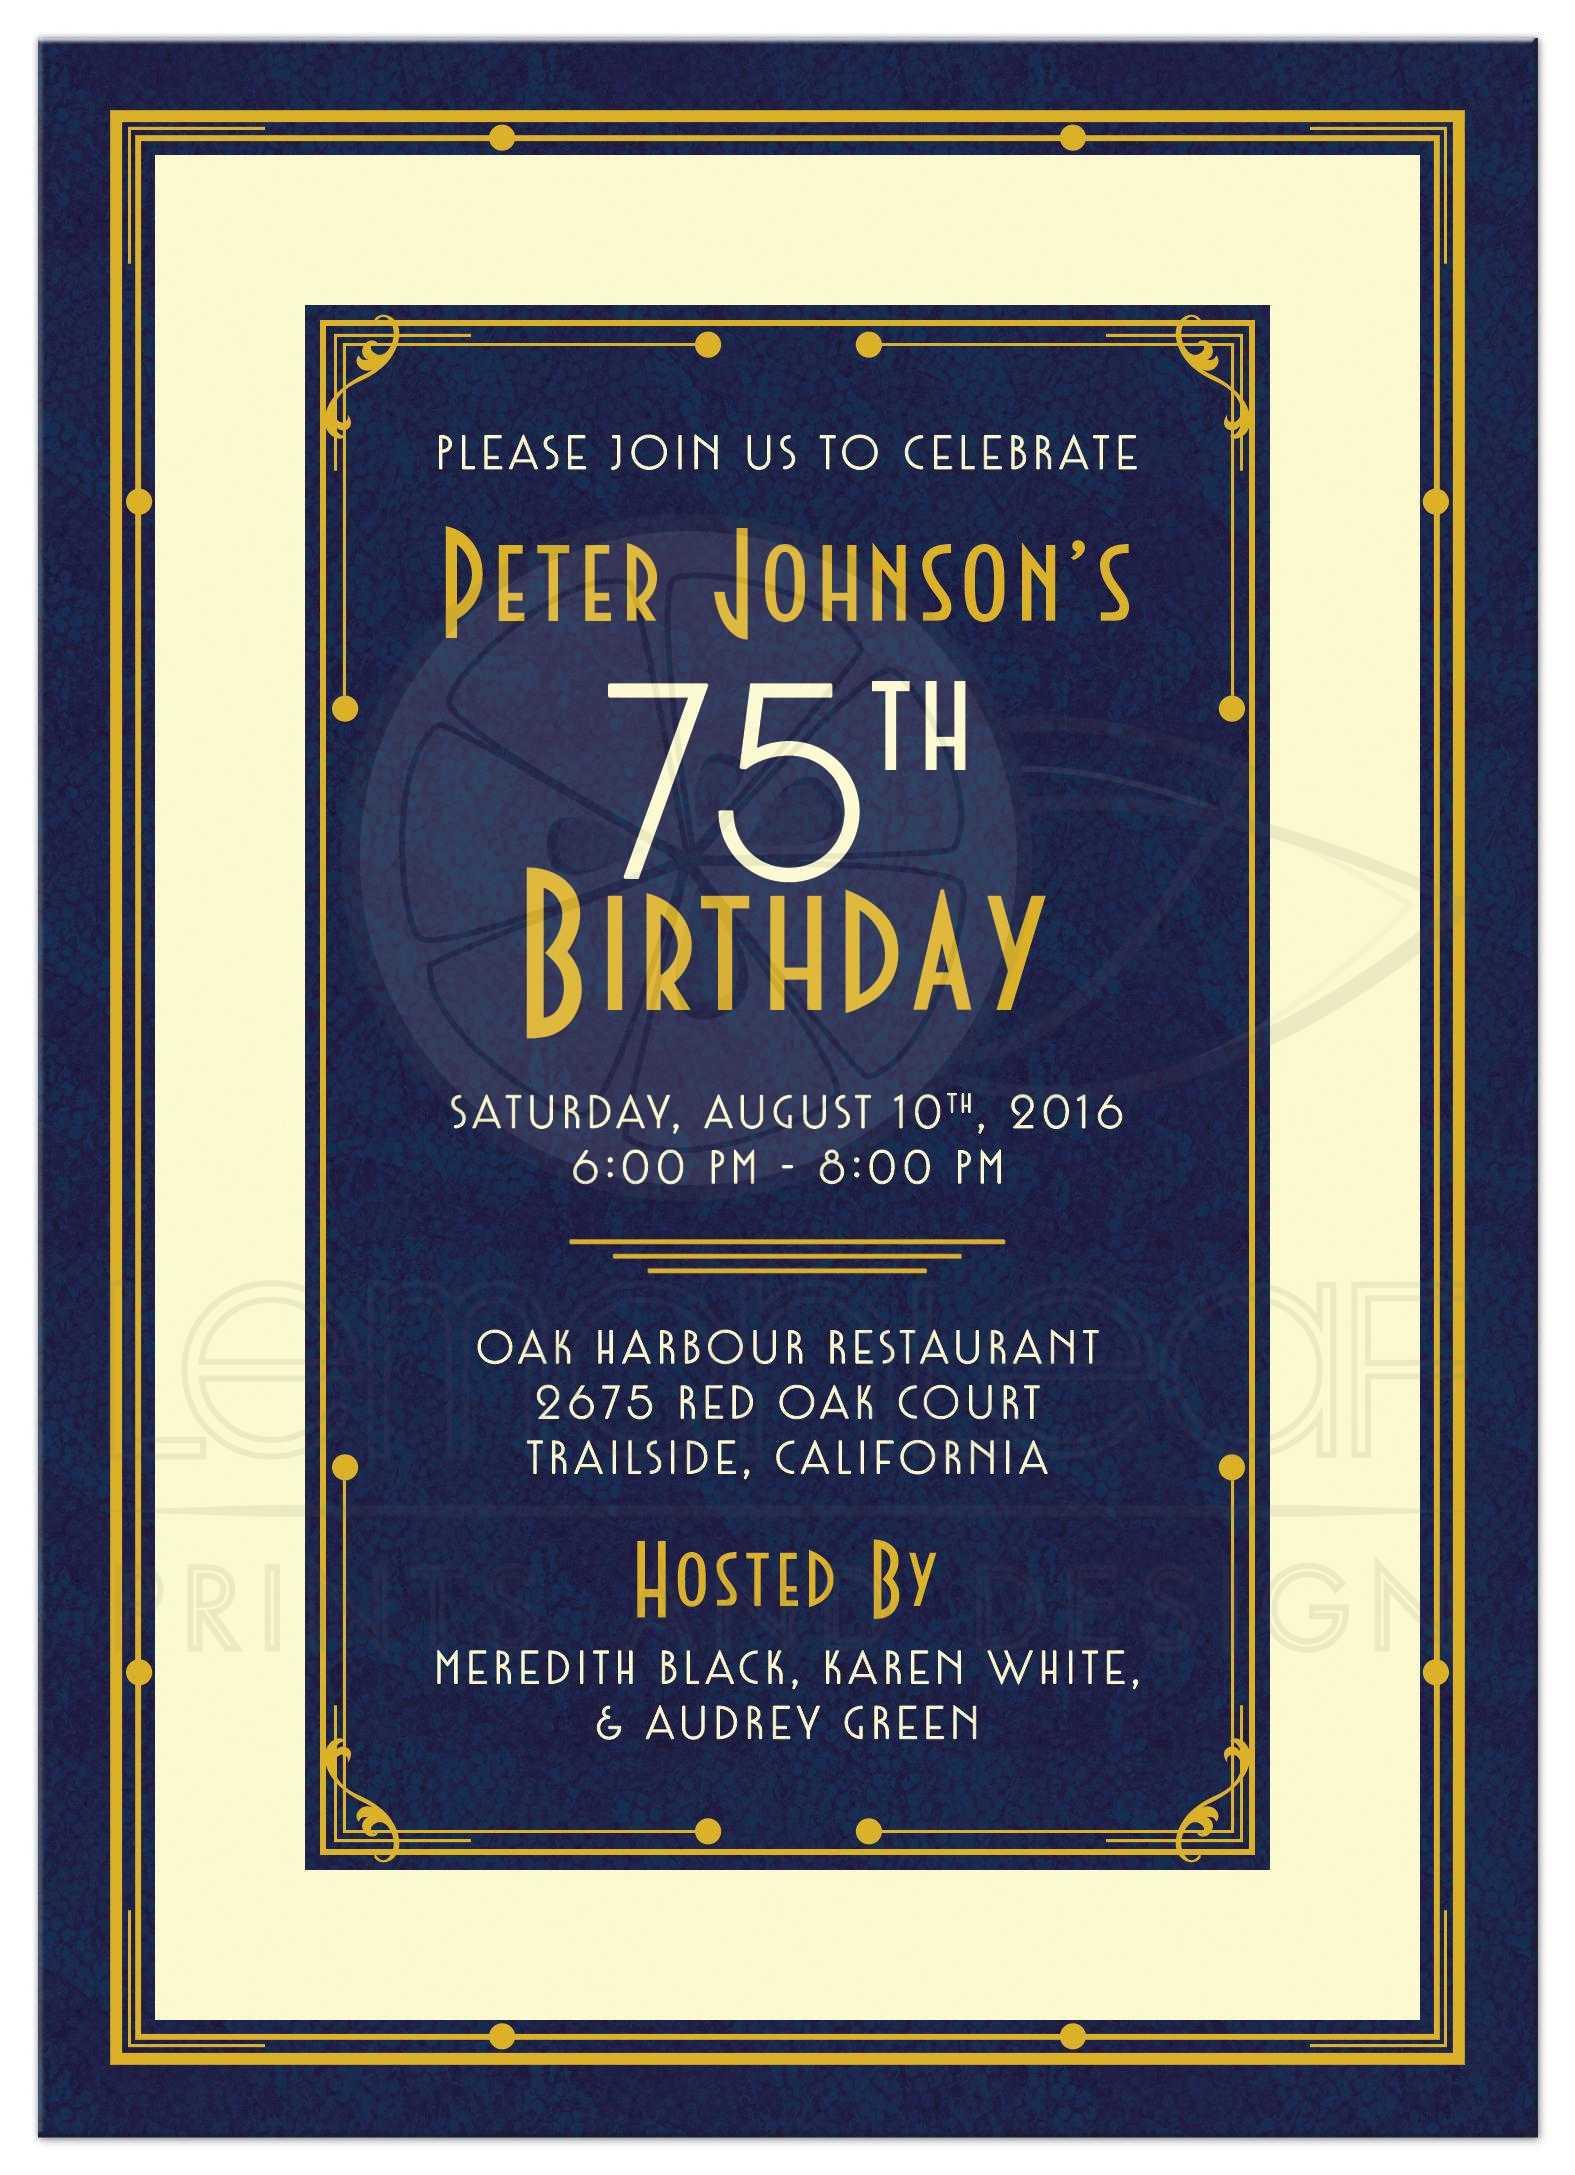 man s 75th birthday invitation art deco navy blue and gold